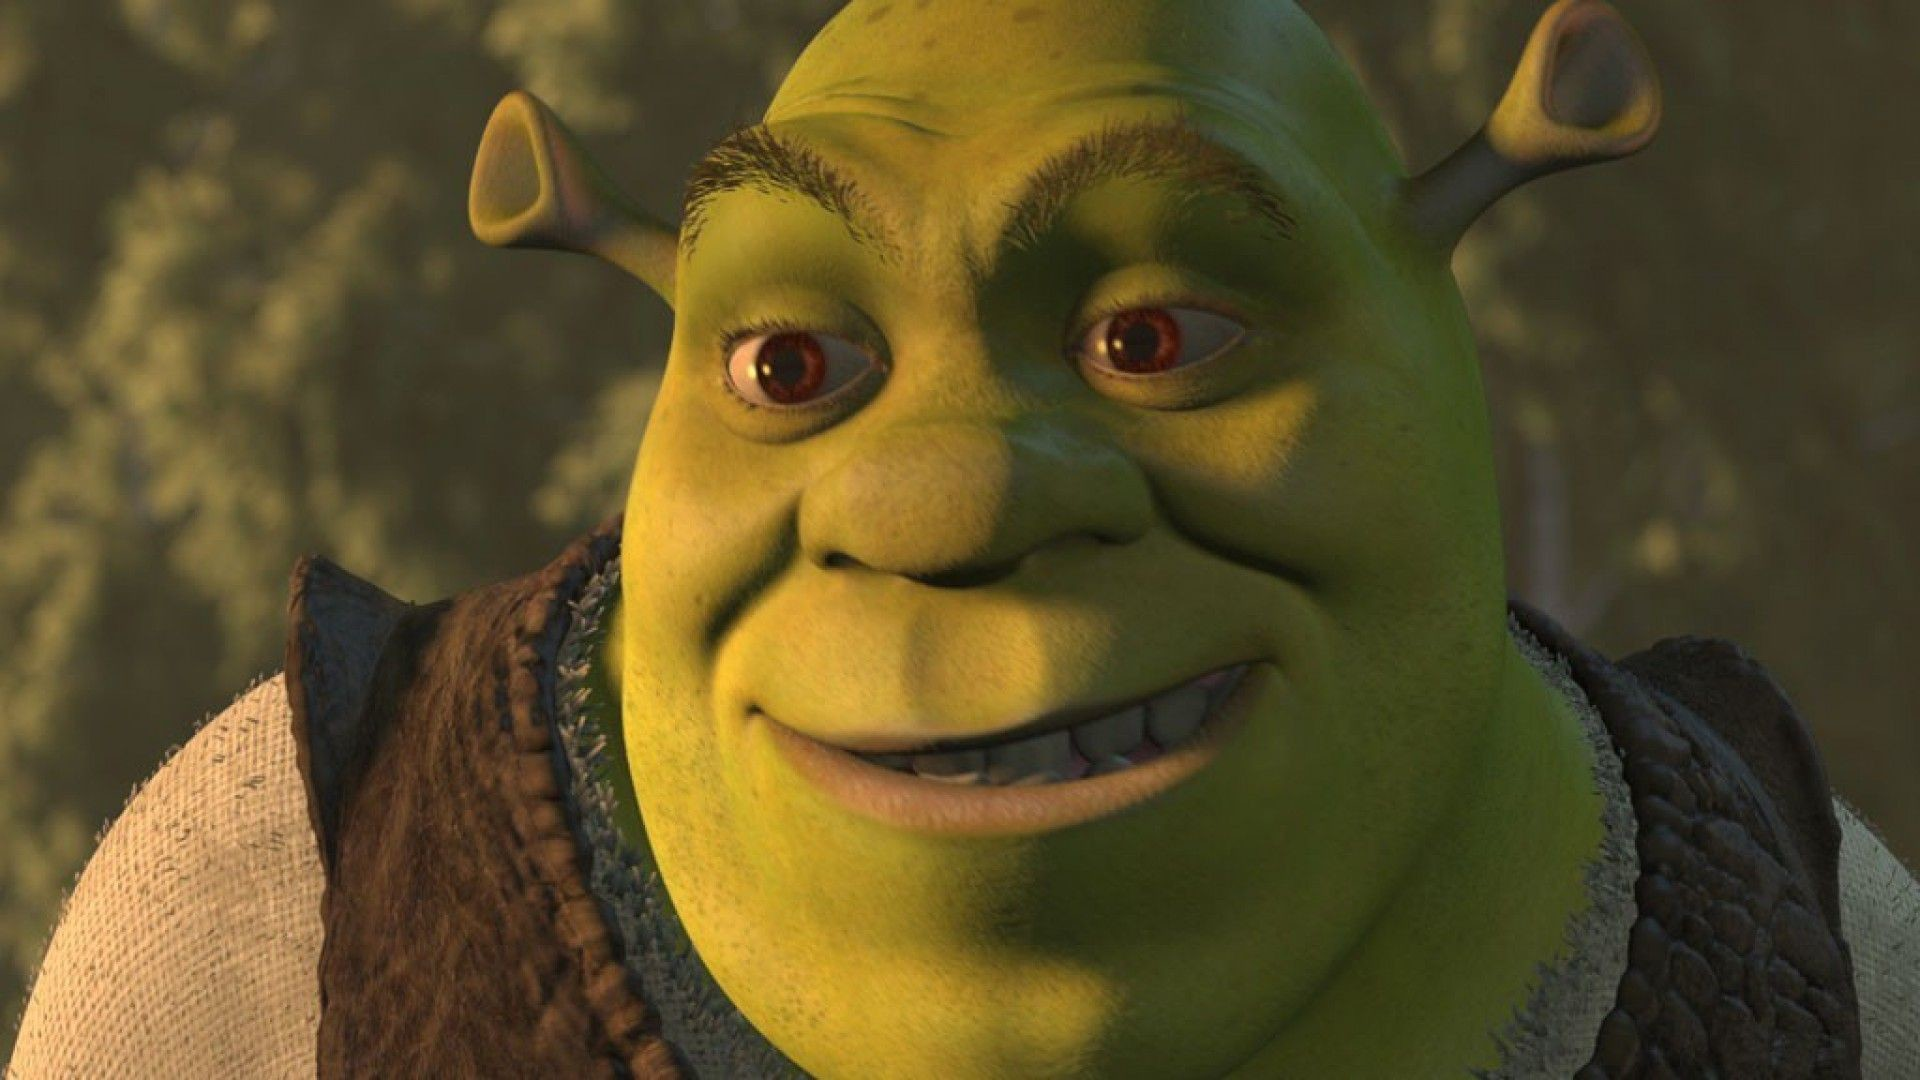 Shrek HD Wallpapers Backgrounds Wallpaper 1920×1200 Shrek Wallpaper (52  Wallpapers) | Adorable